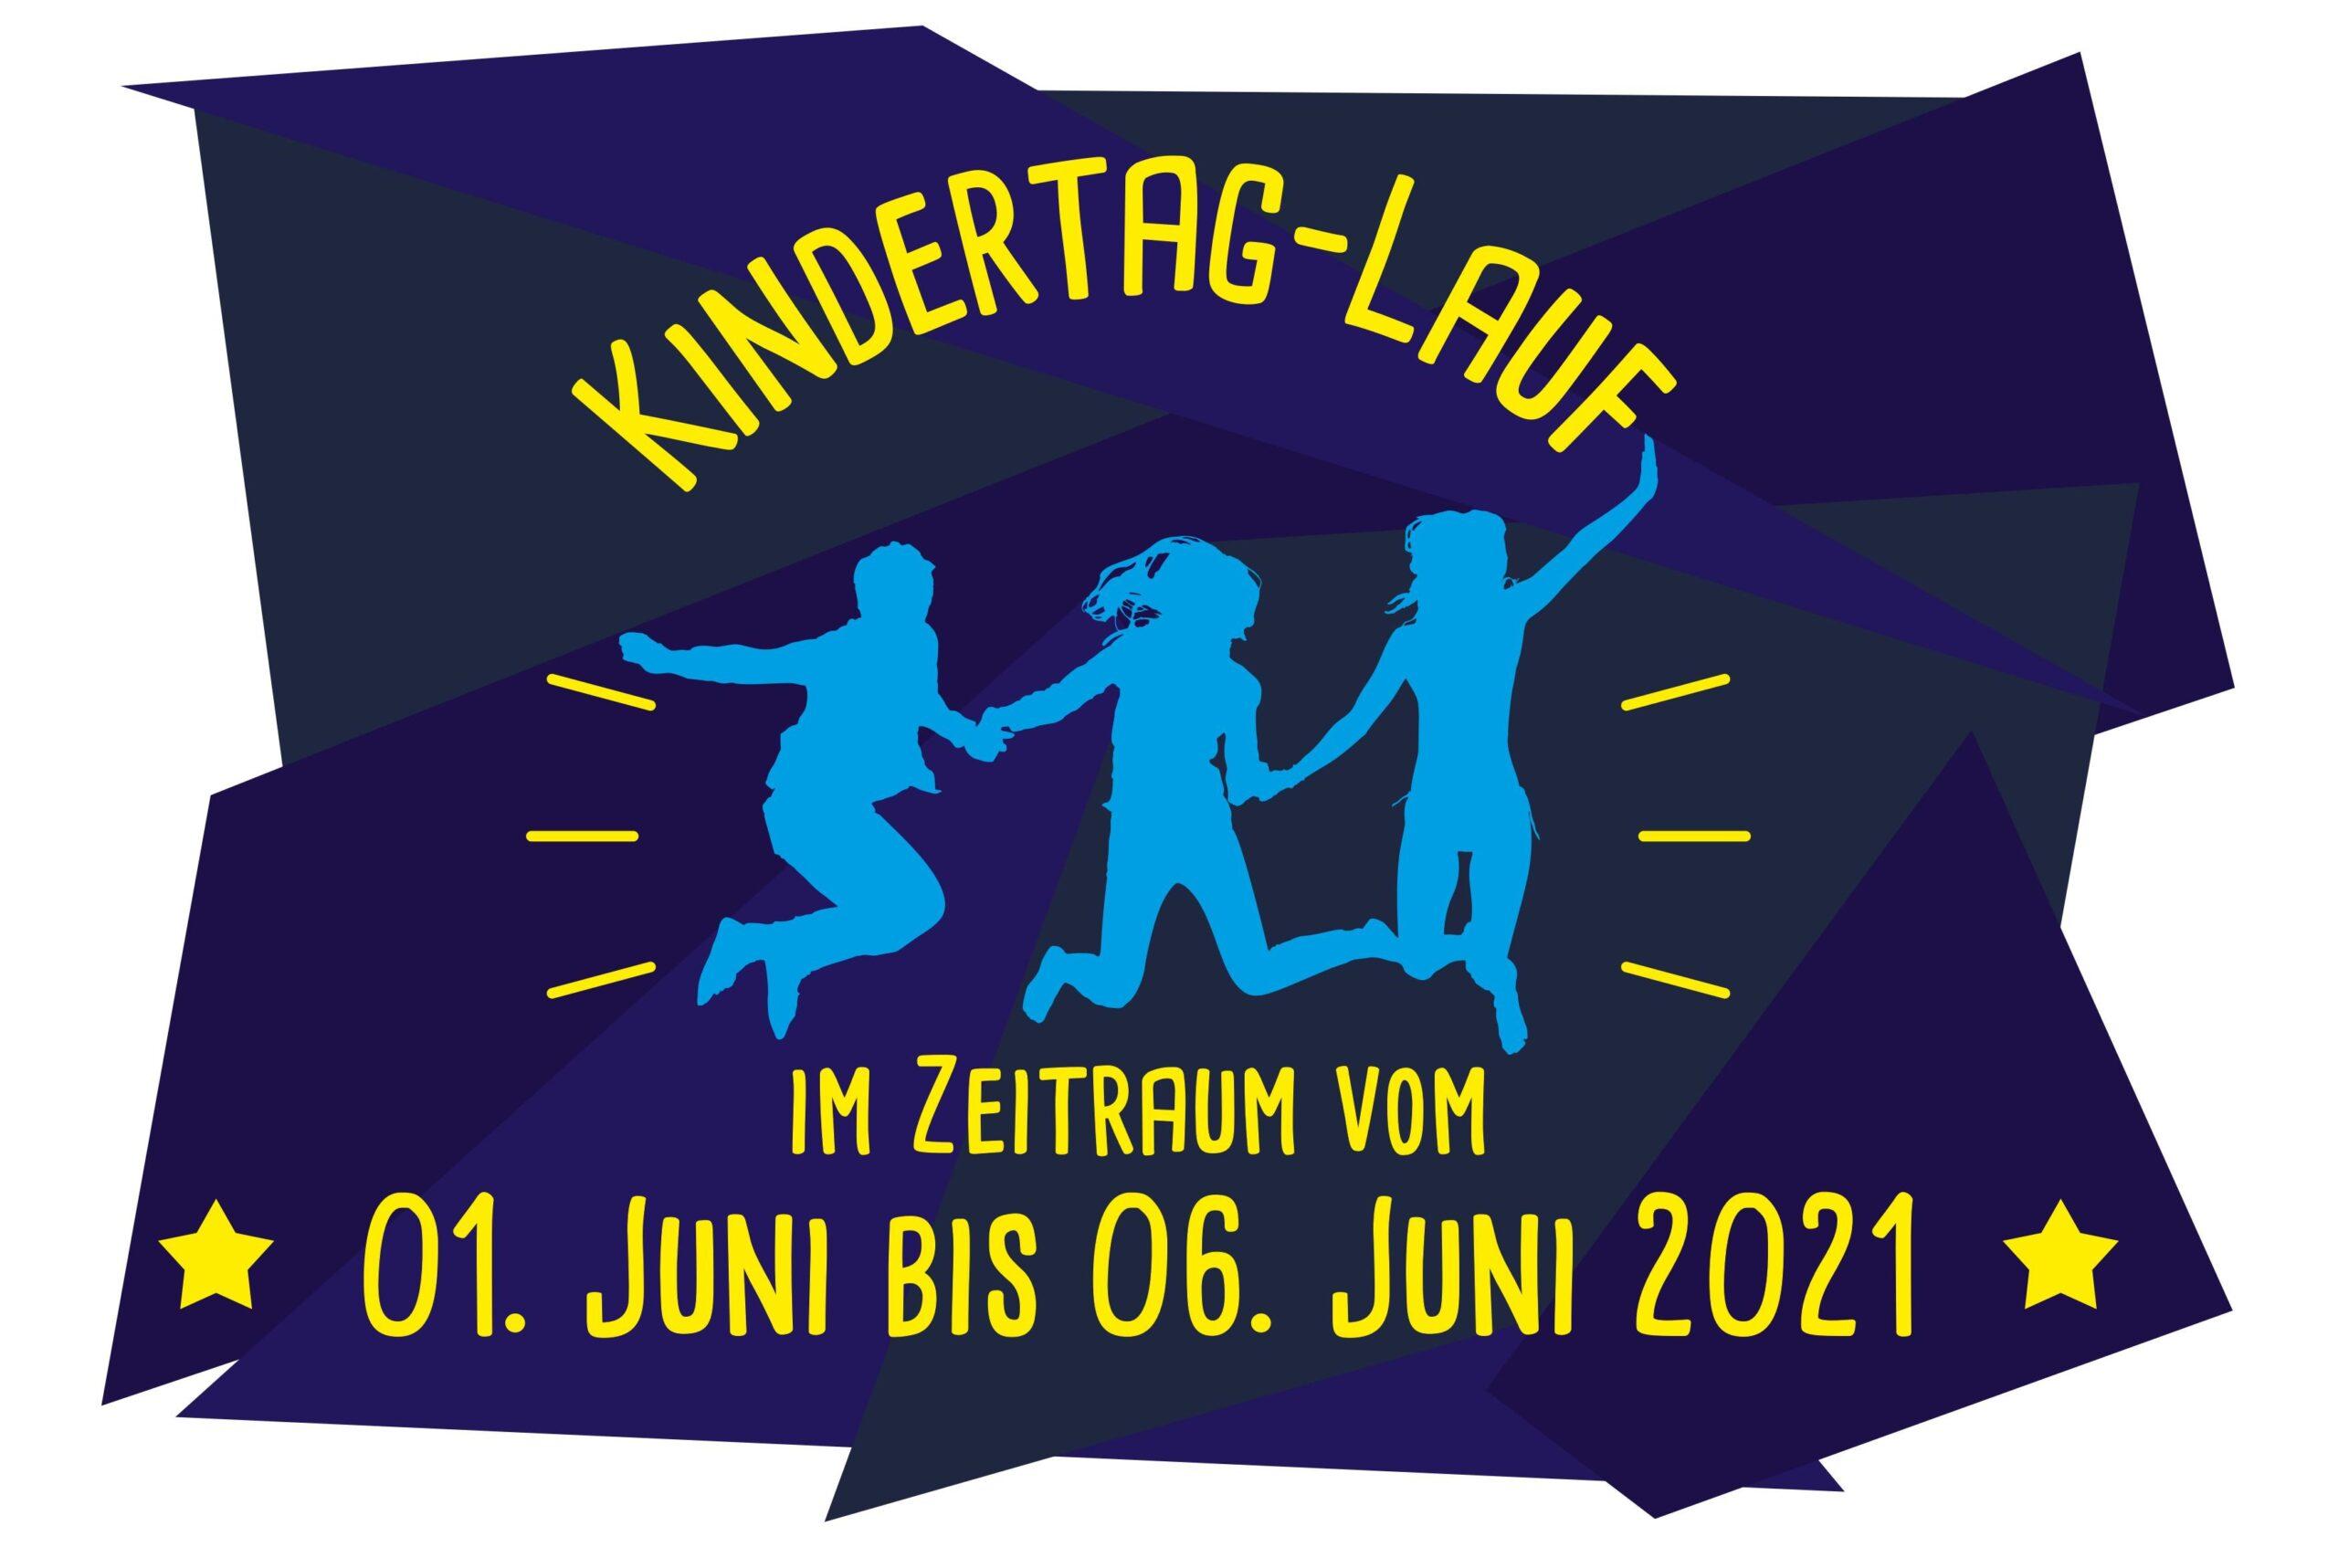 Kindertag-Lauf